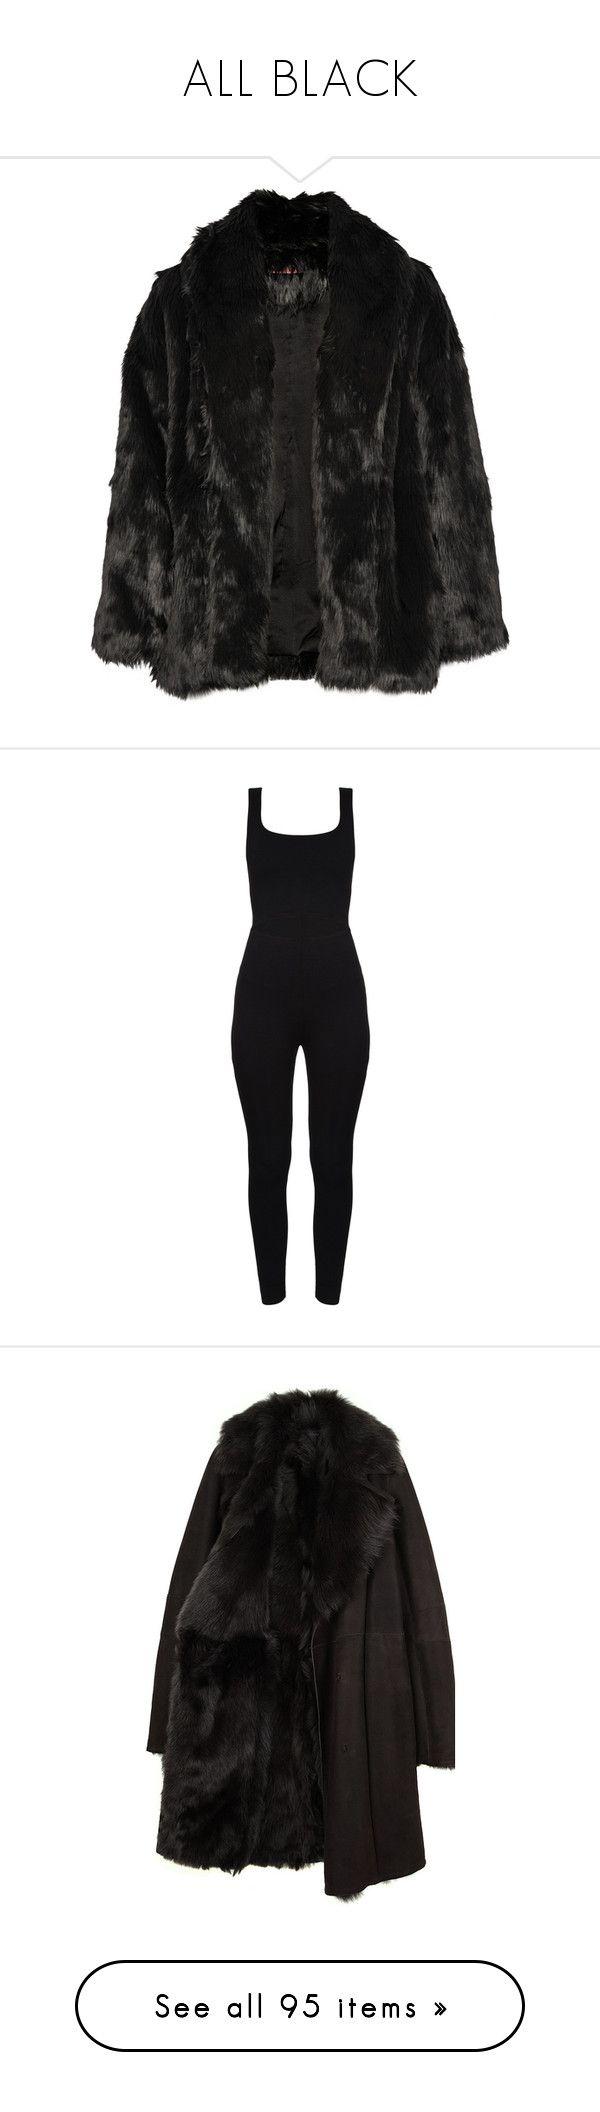 """ALL BLACK"" by neide-goncalvesbrito on Polyvore featuring outerwear, coats, jackets, coats & jackets, takit, black, imitation fur coats, oversized coat, faux fur coat et fake fur coats"